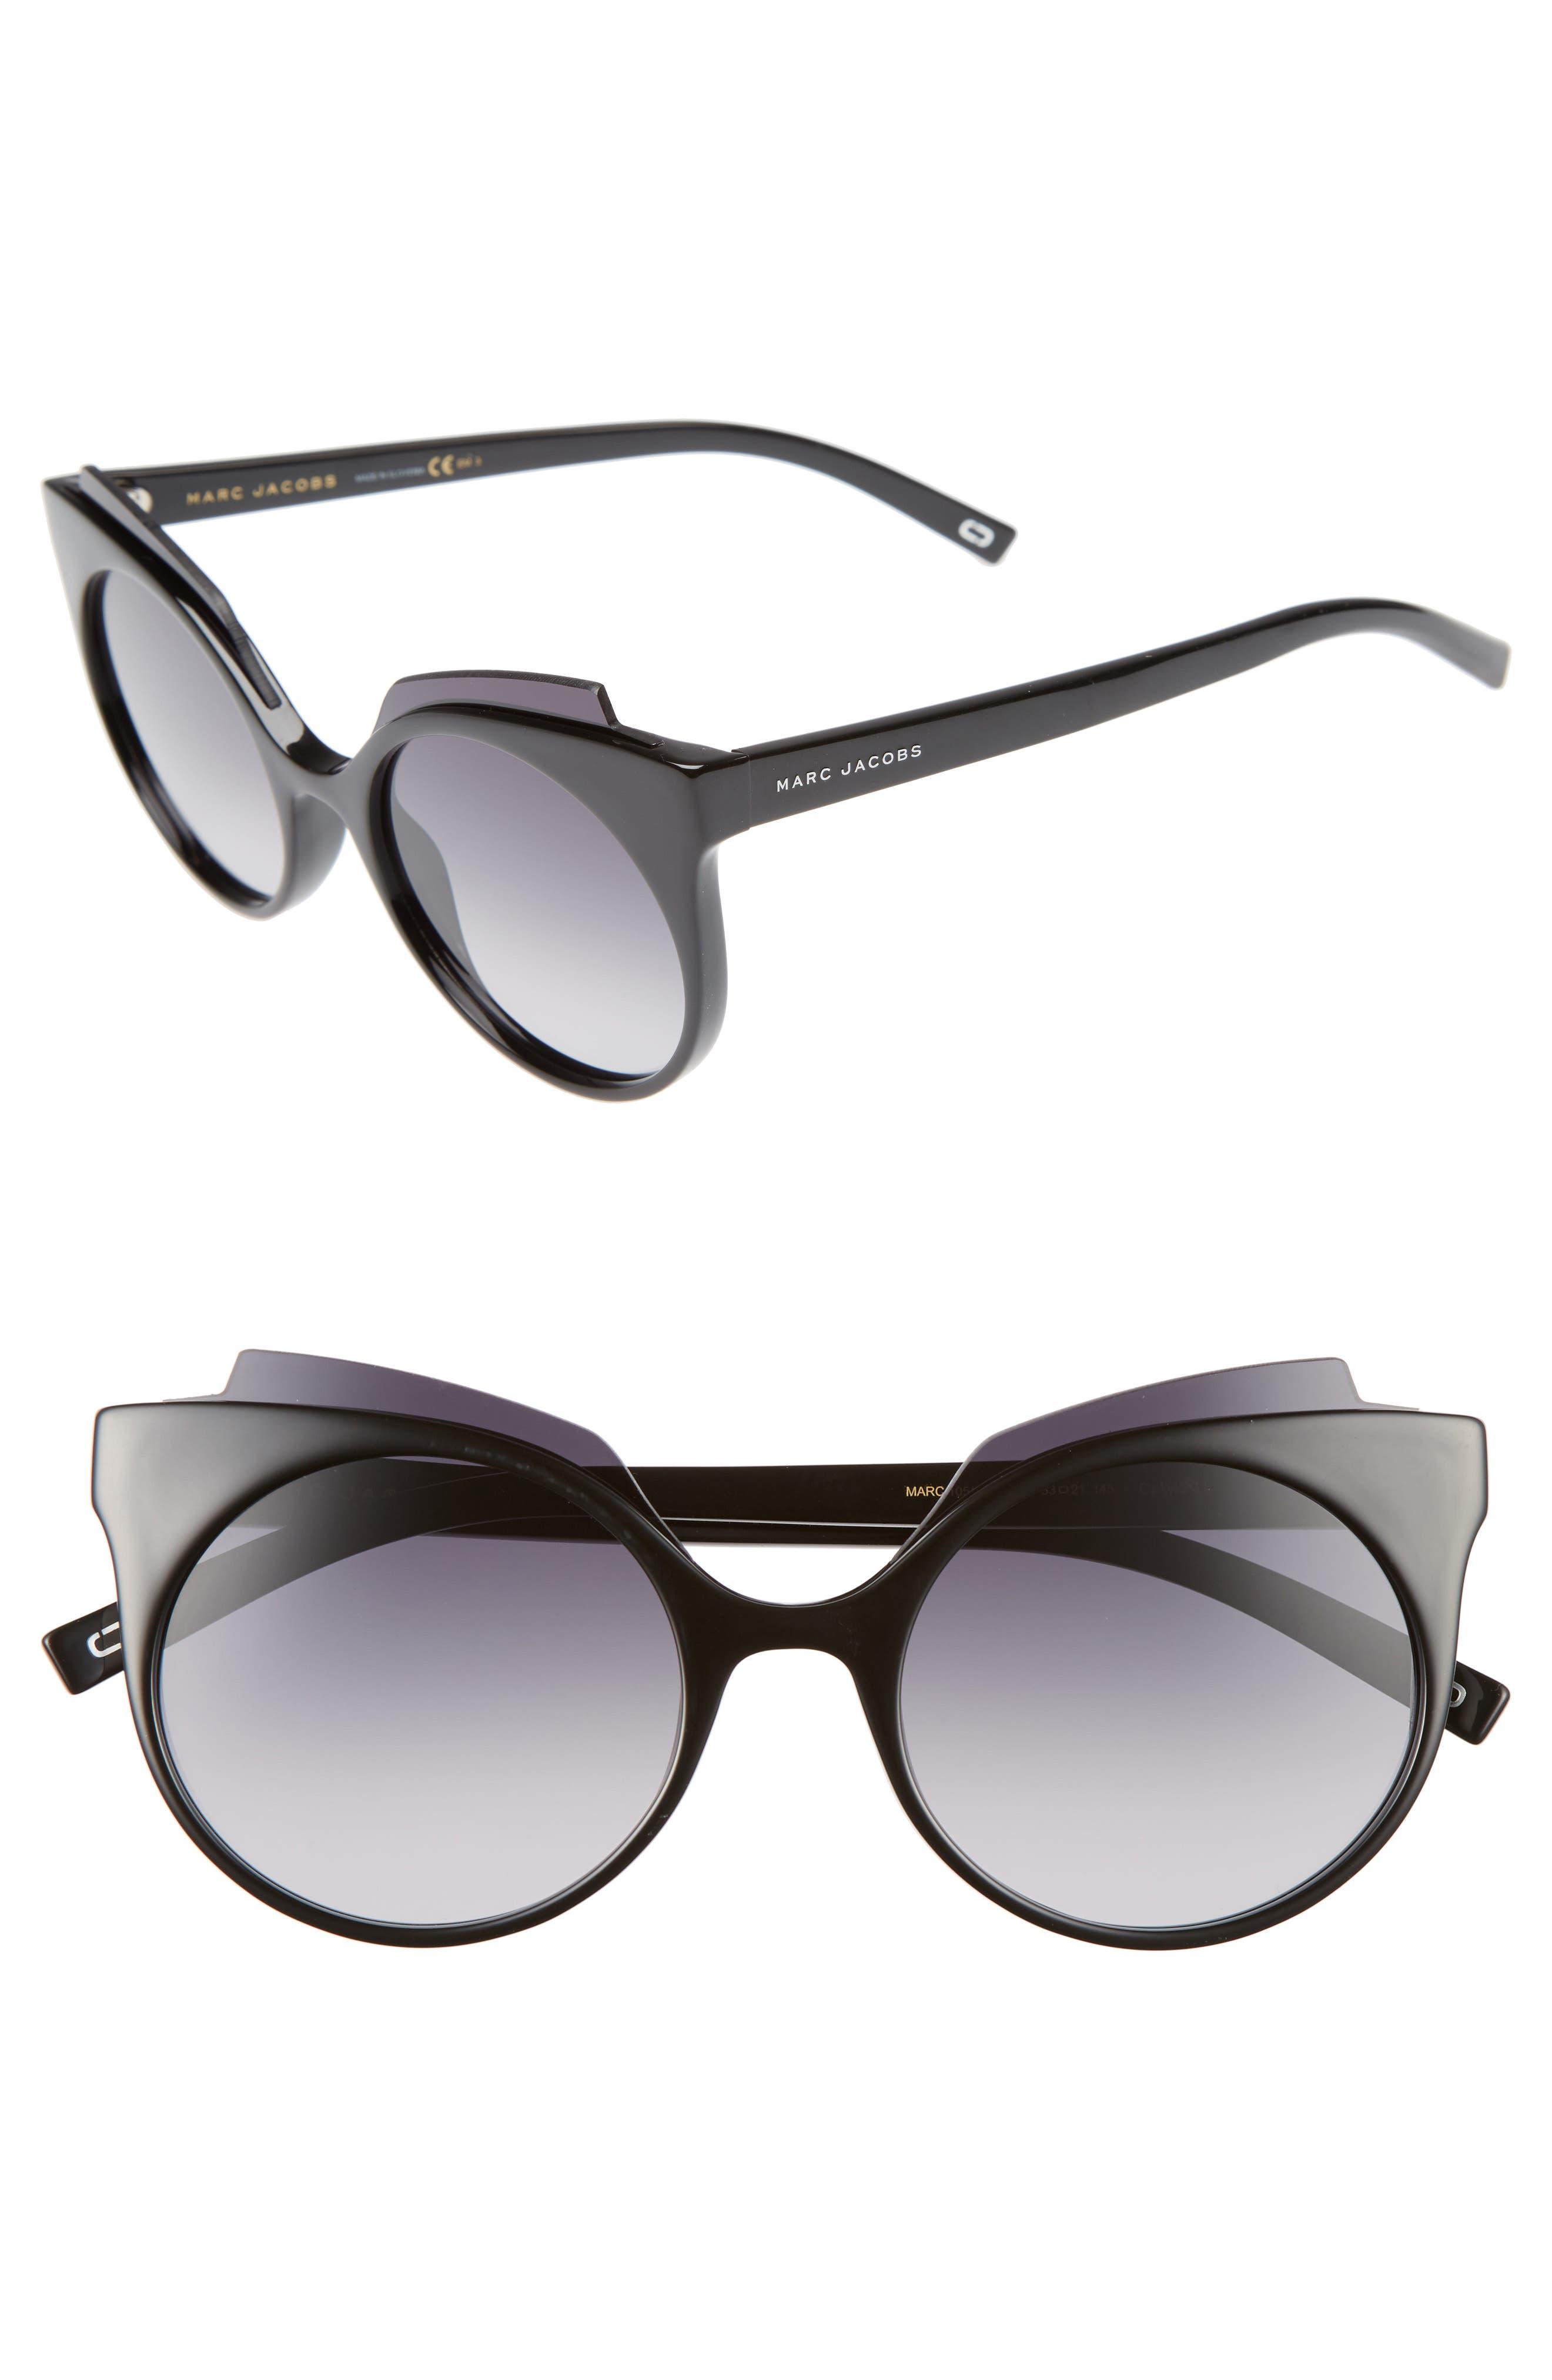 53mm Oversized Sunglasses,                         Main,                         color, 001